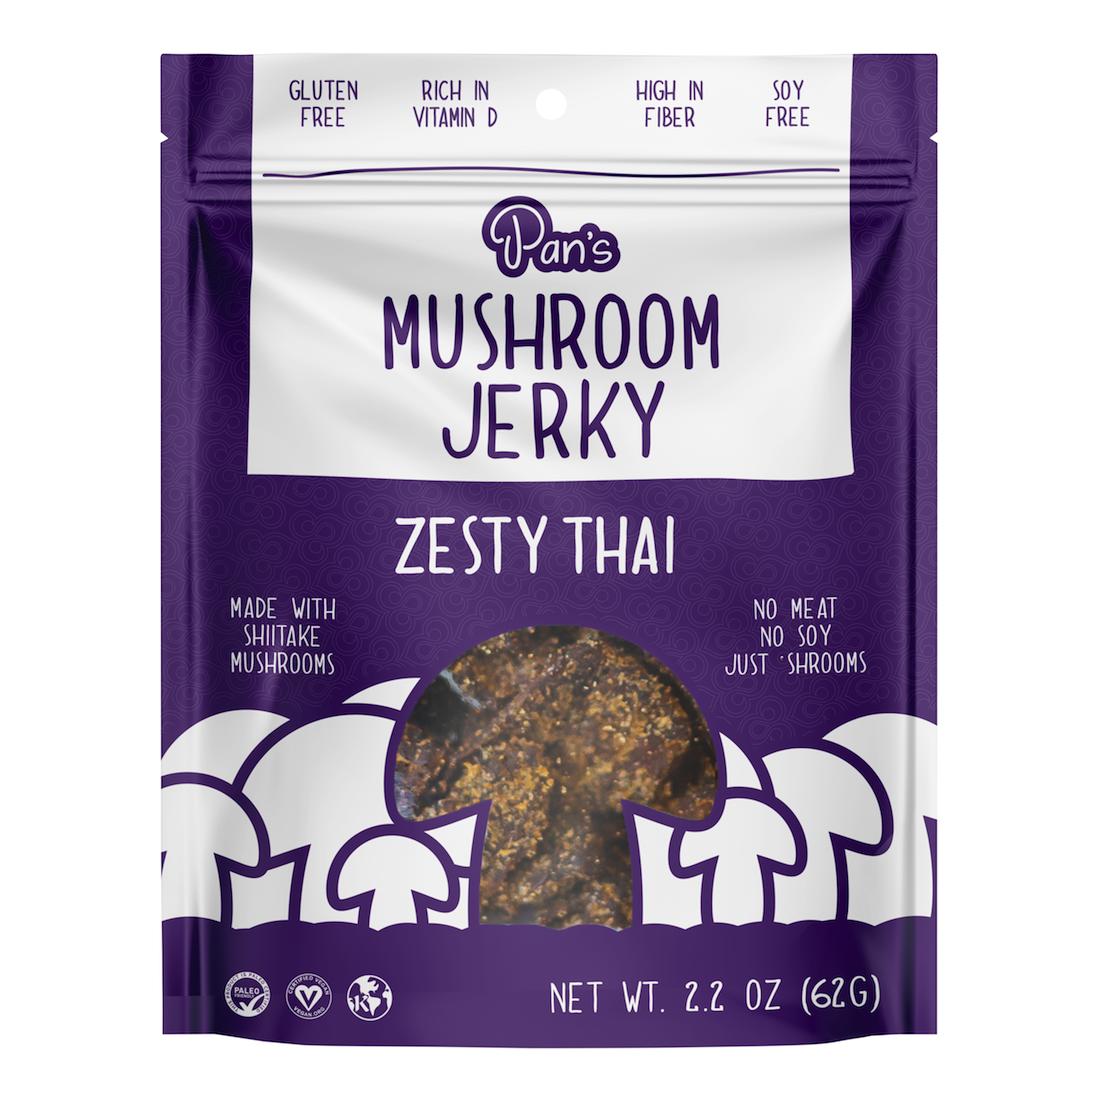 Zesty Thai - Pan's Mushroom Jerky - Certified Paleo Friendly, PaleoVegan by the Paleo Foundation